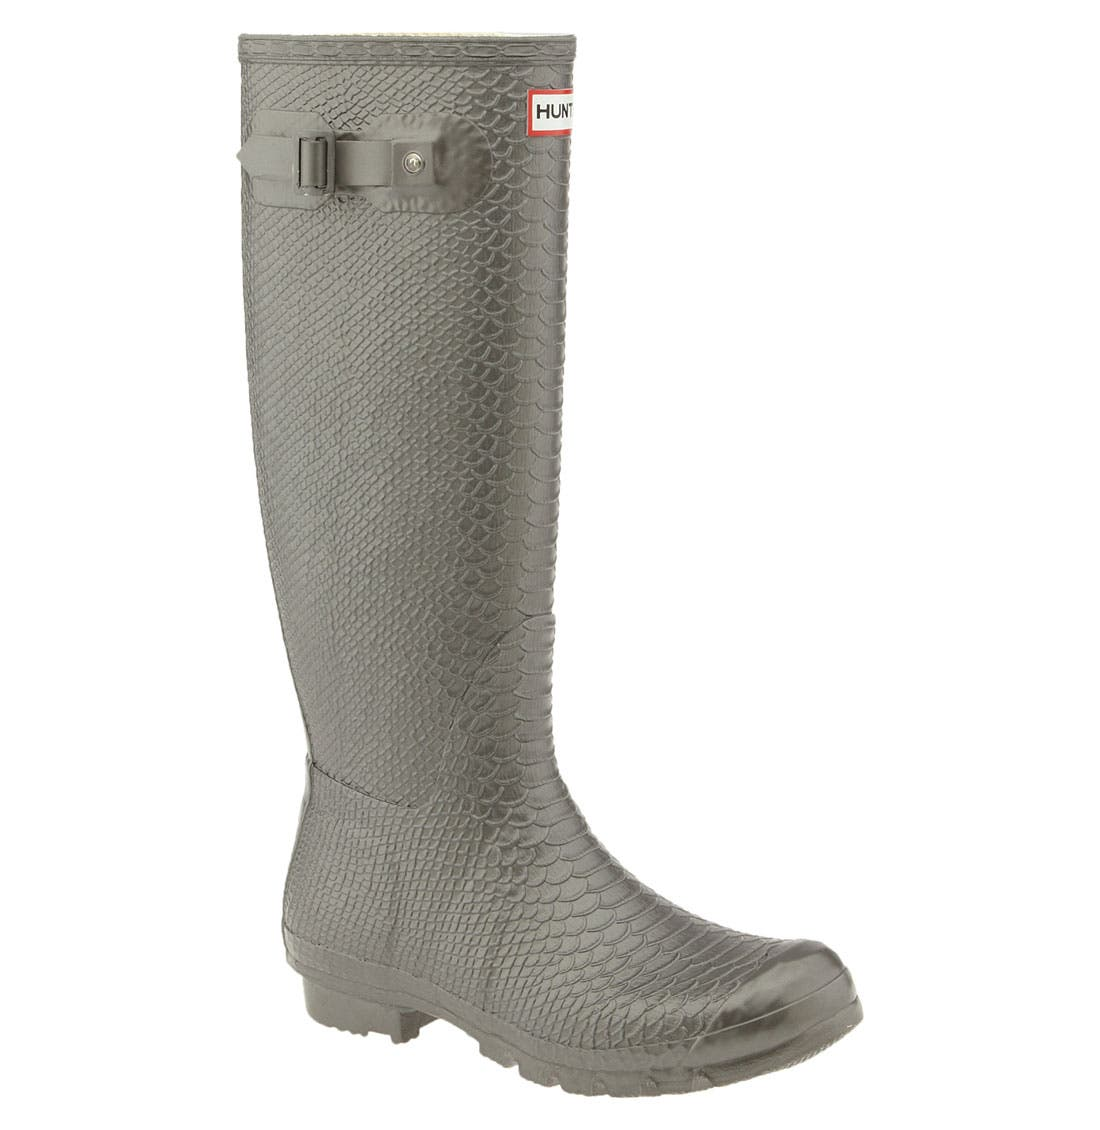 Alternate Image 1 Selected - Hunter 'Boa Tall' Rain Boot